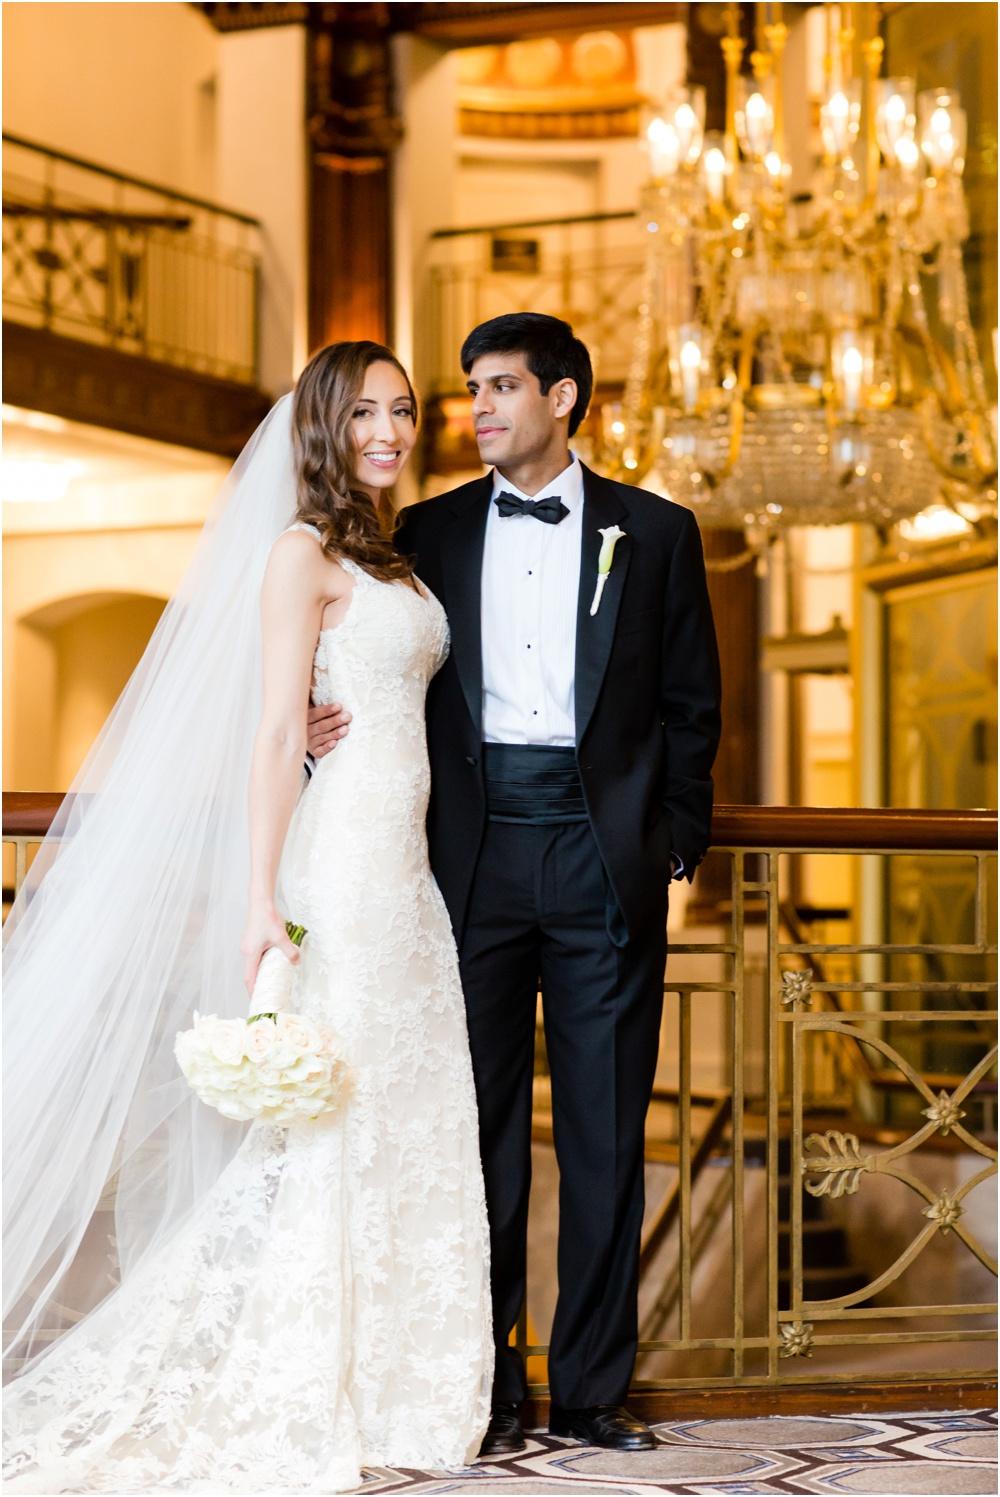 RI-Wedding-Photographer-Lefebvre-Photo-Blog_2937.jpg